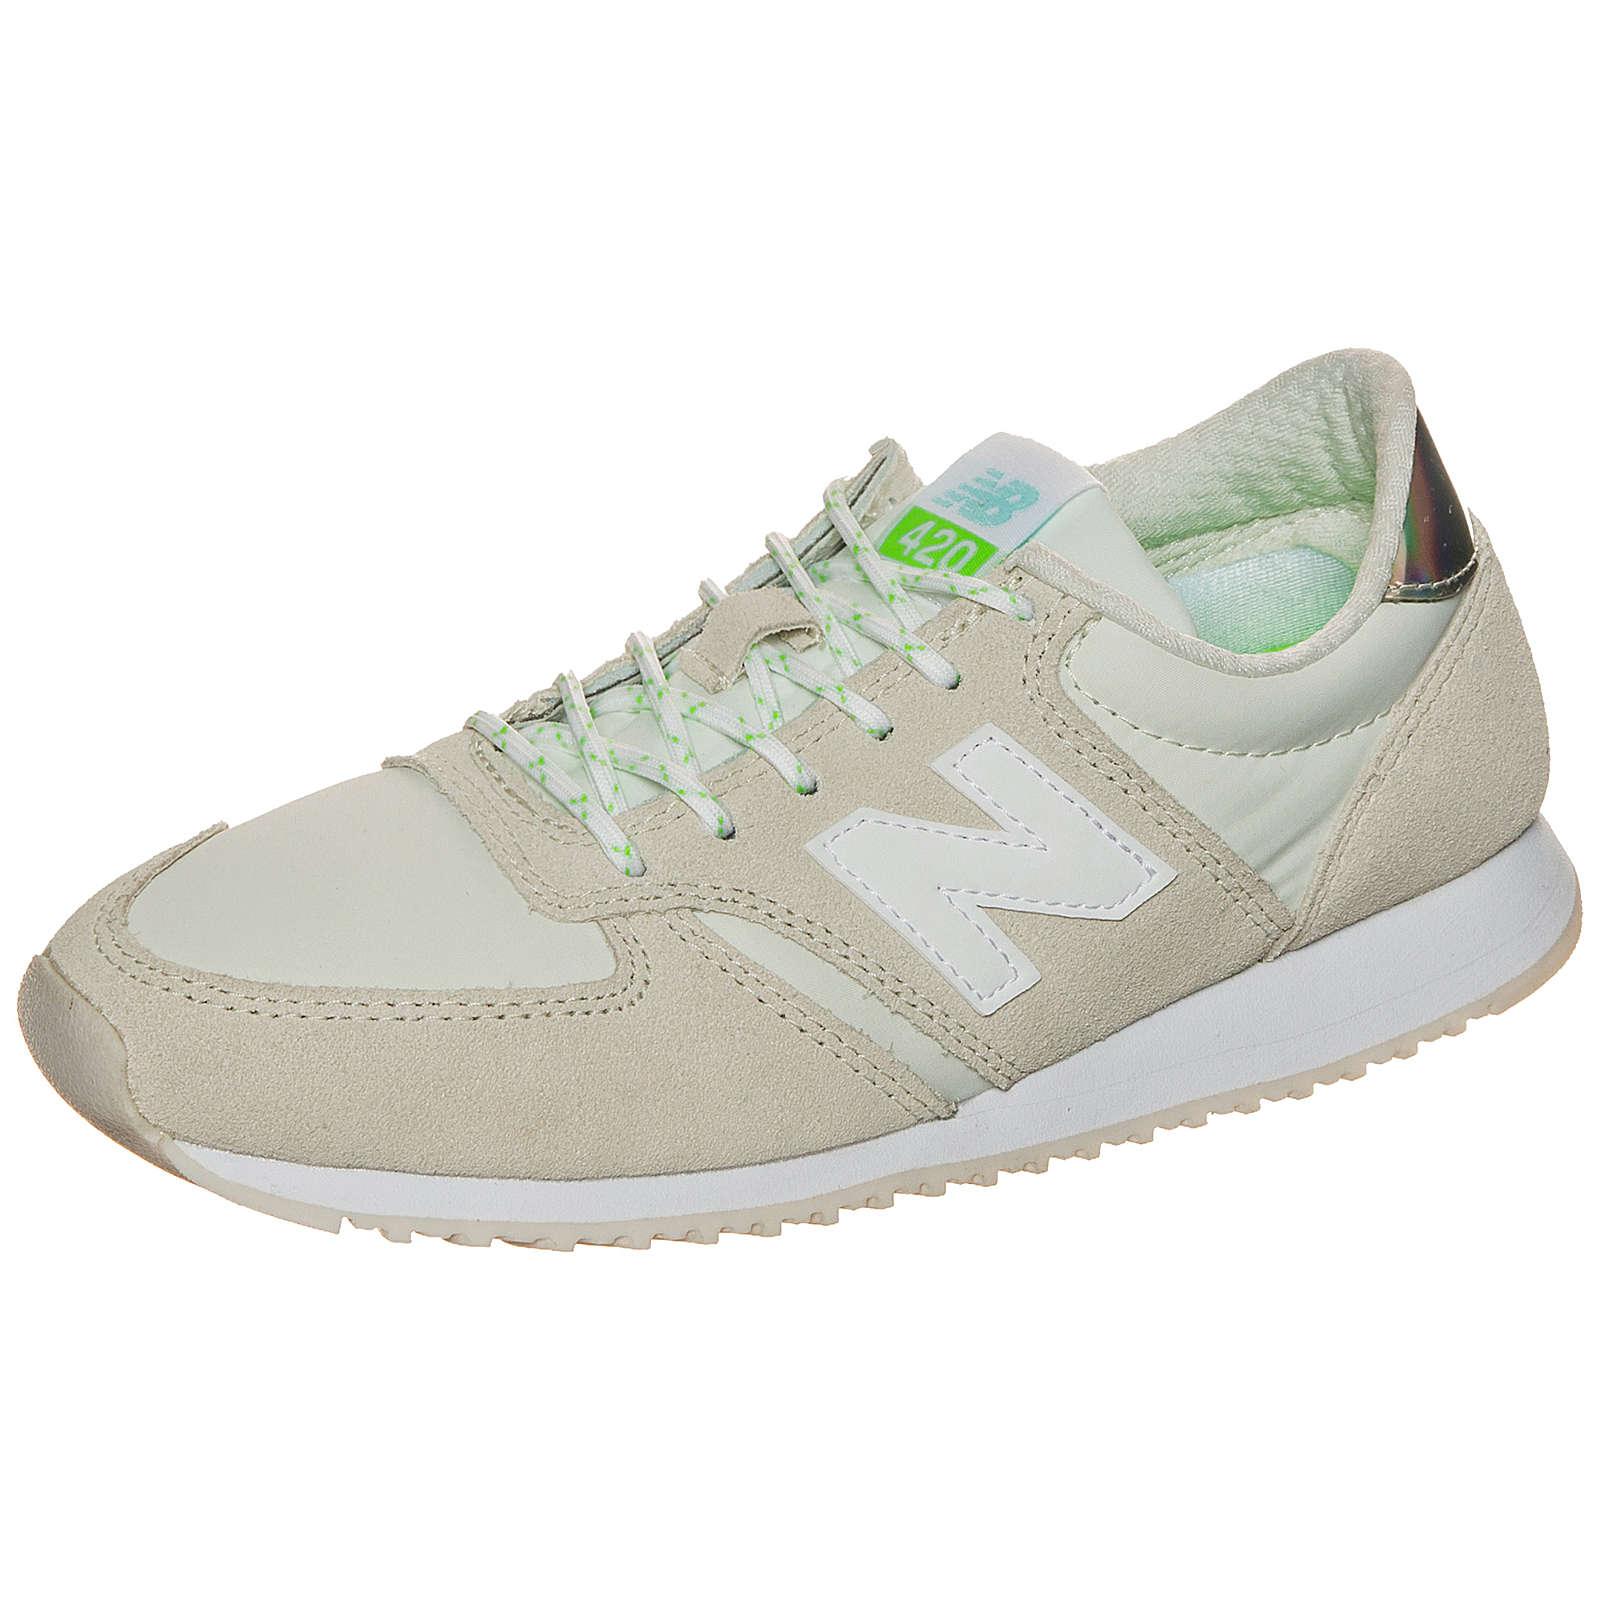 New Balance WL420-AZA-B Sneaker Damen beige-kombi Damen Gr. 40,5